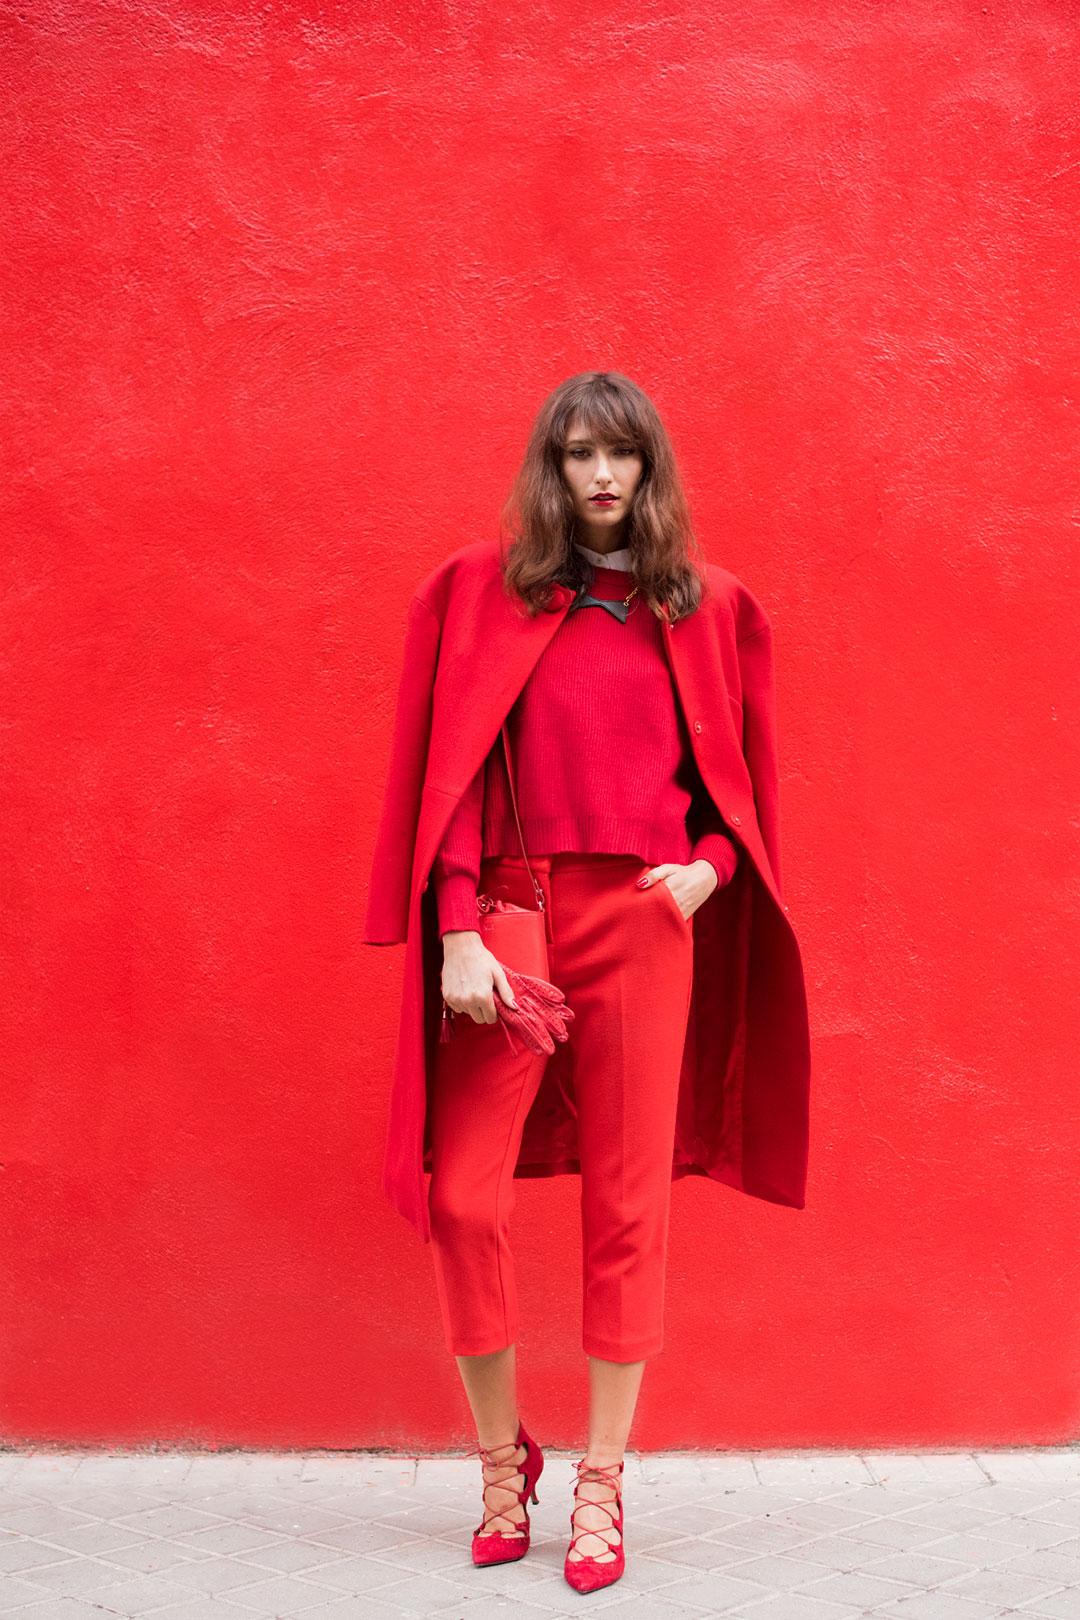 red-bow-tie-guerlain-streetstyle-mitmeblog-web-01